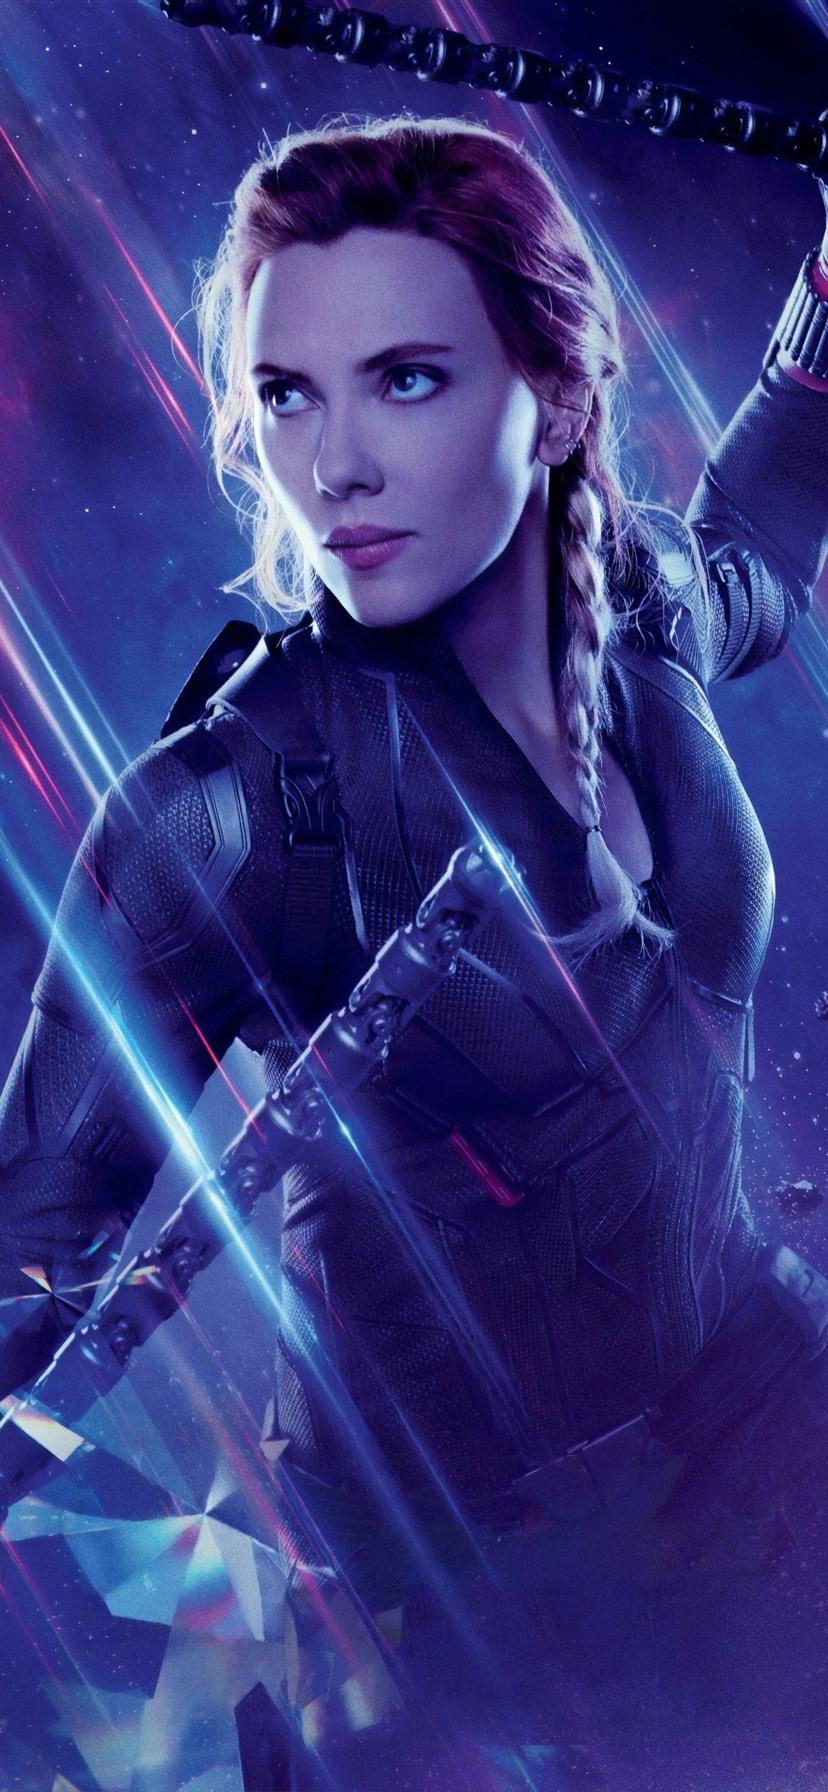 Wallpaper Black Widow, movie 2020 2880x1800 HD Picture, Image